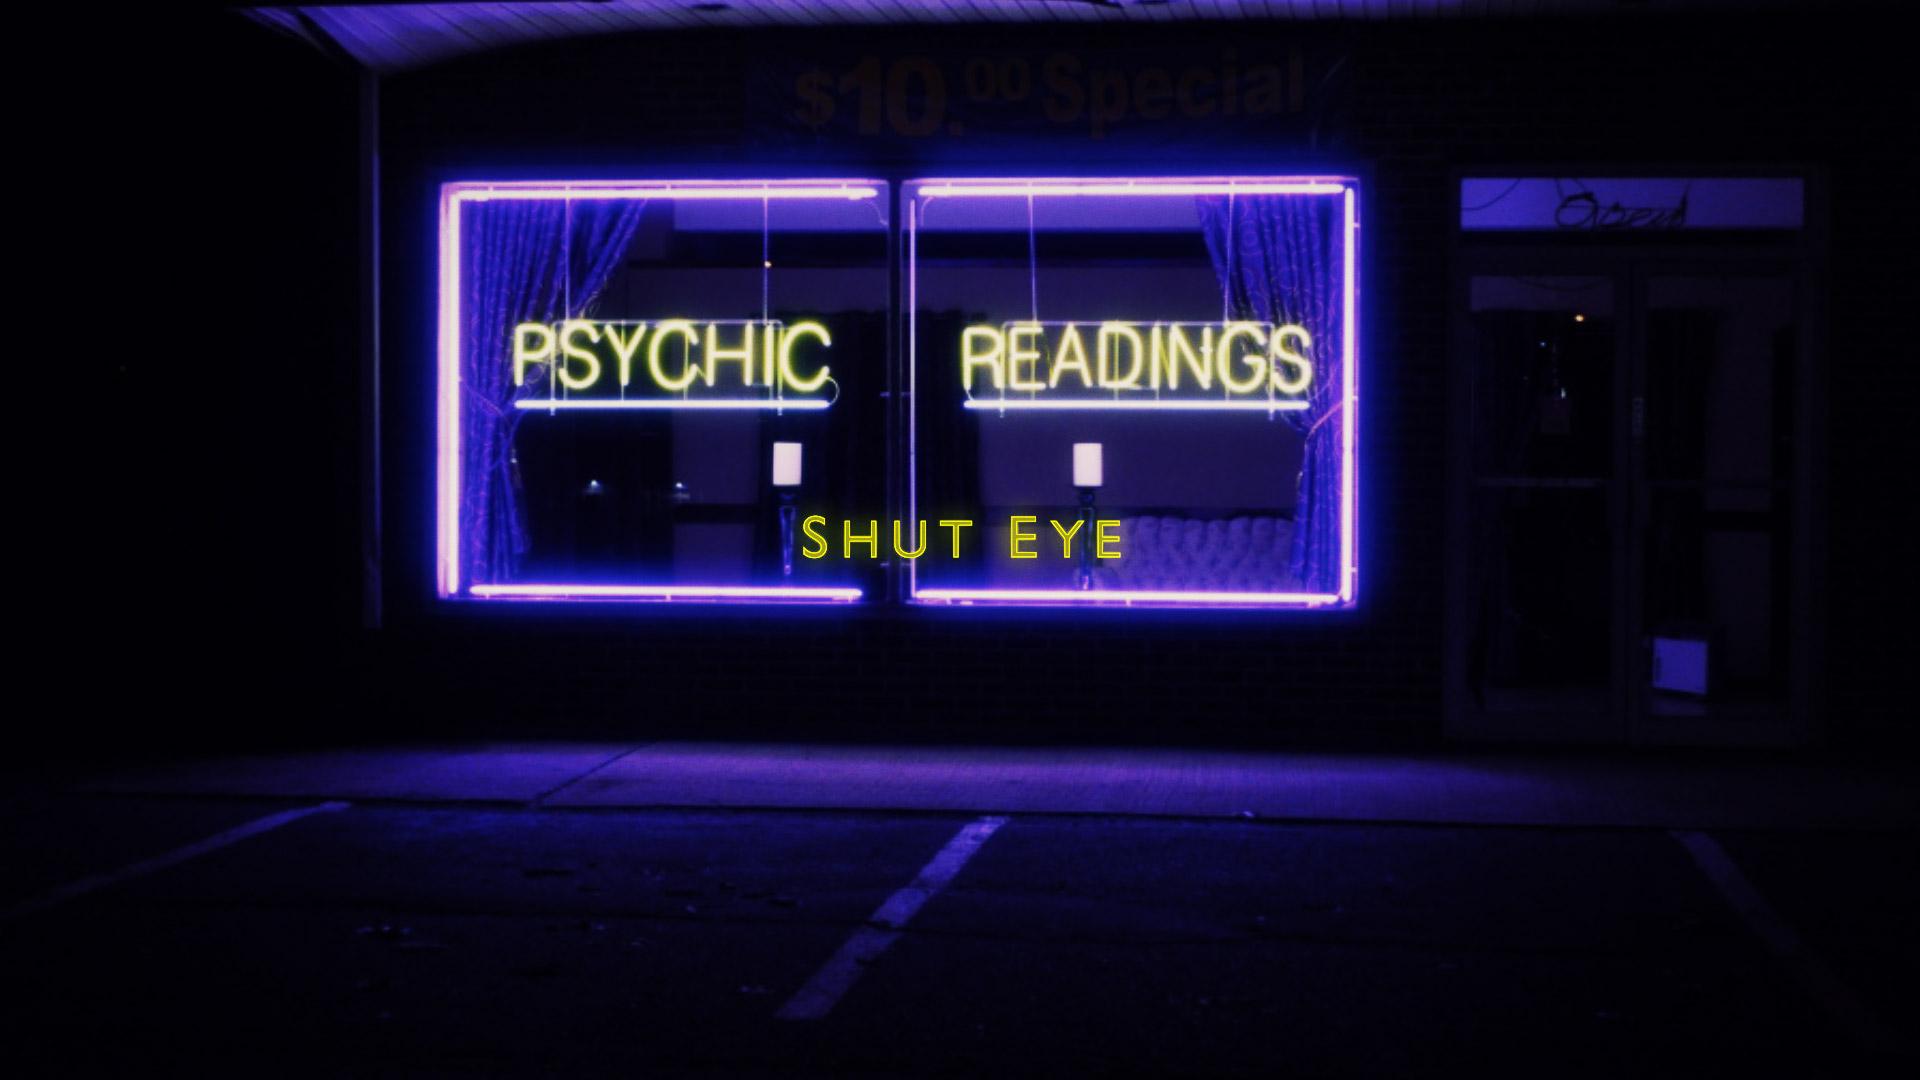 tcgstudio-shut-eye-main-title-v3_00002.jpg